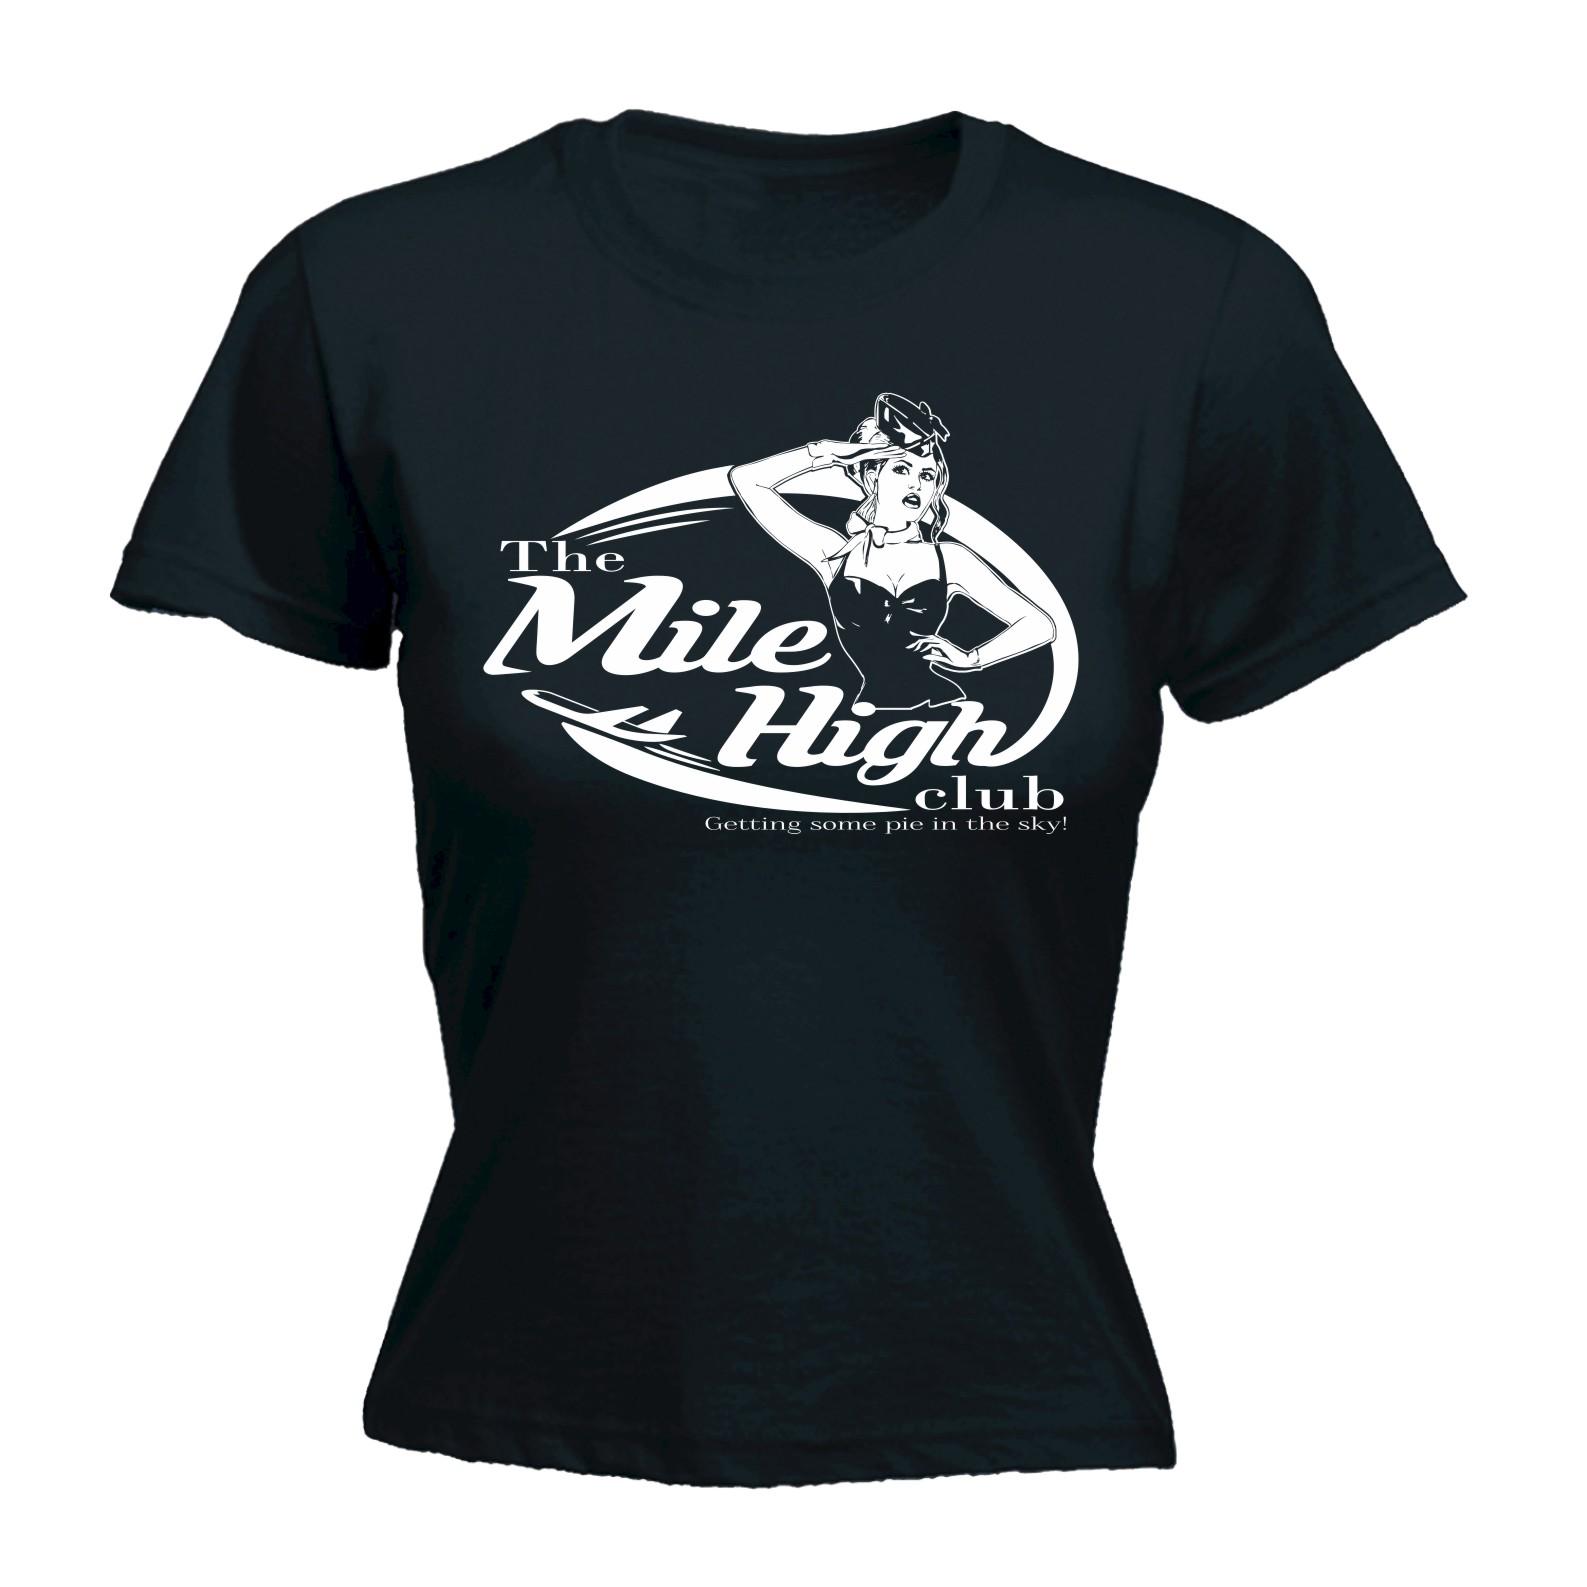 miles high club